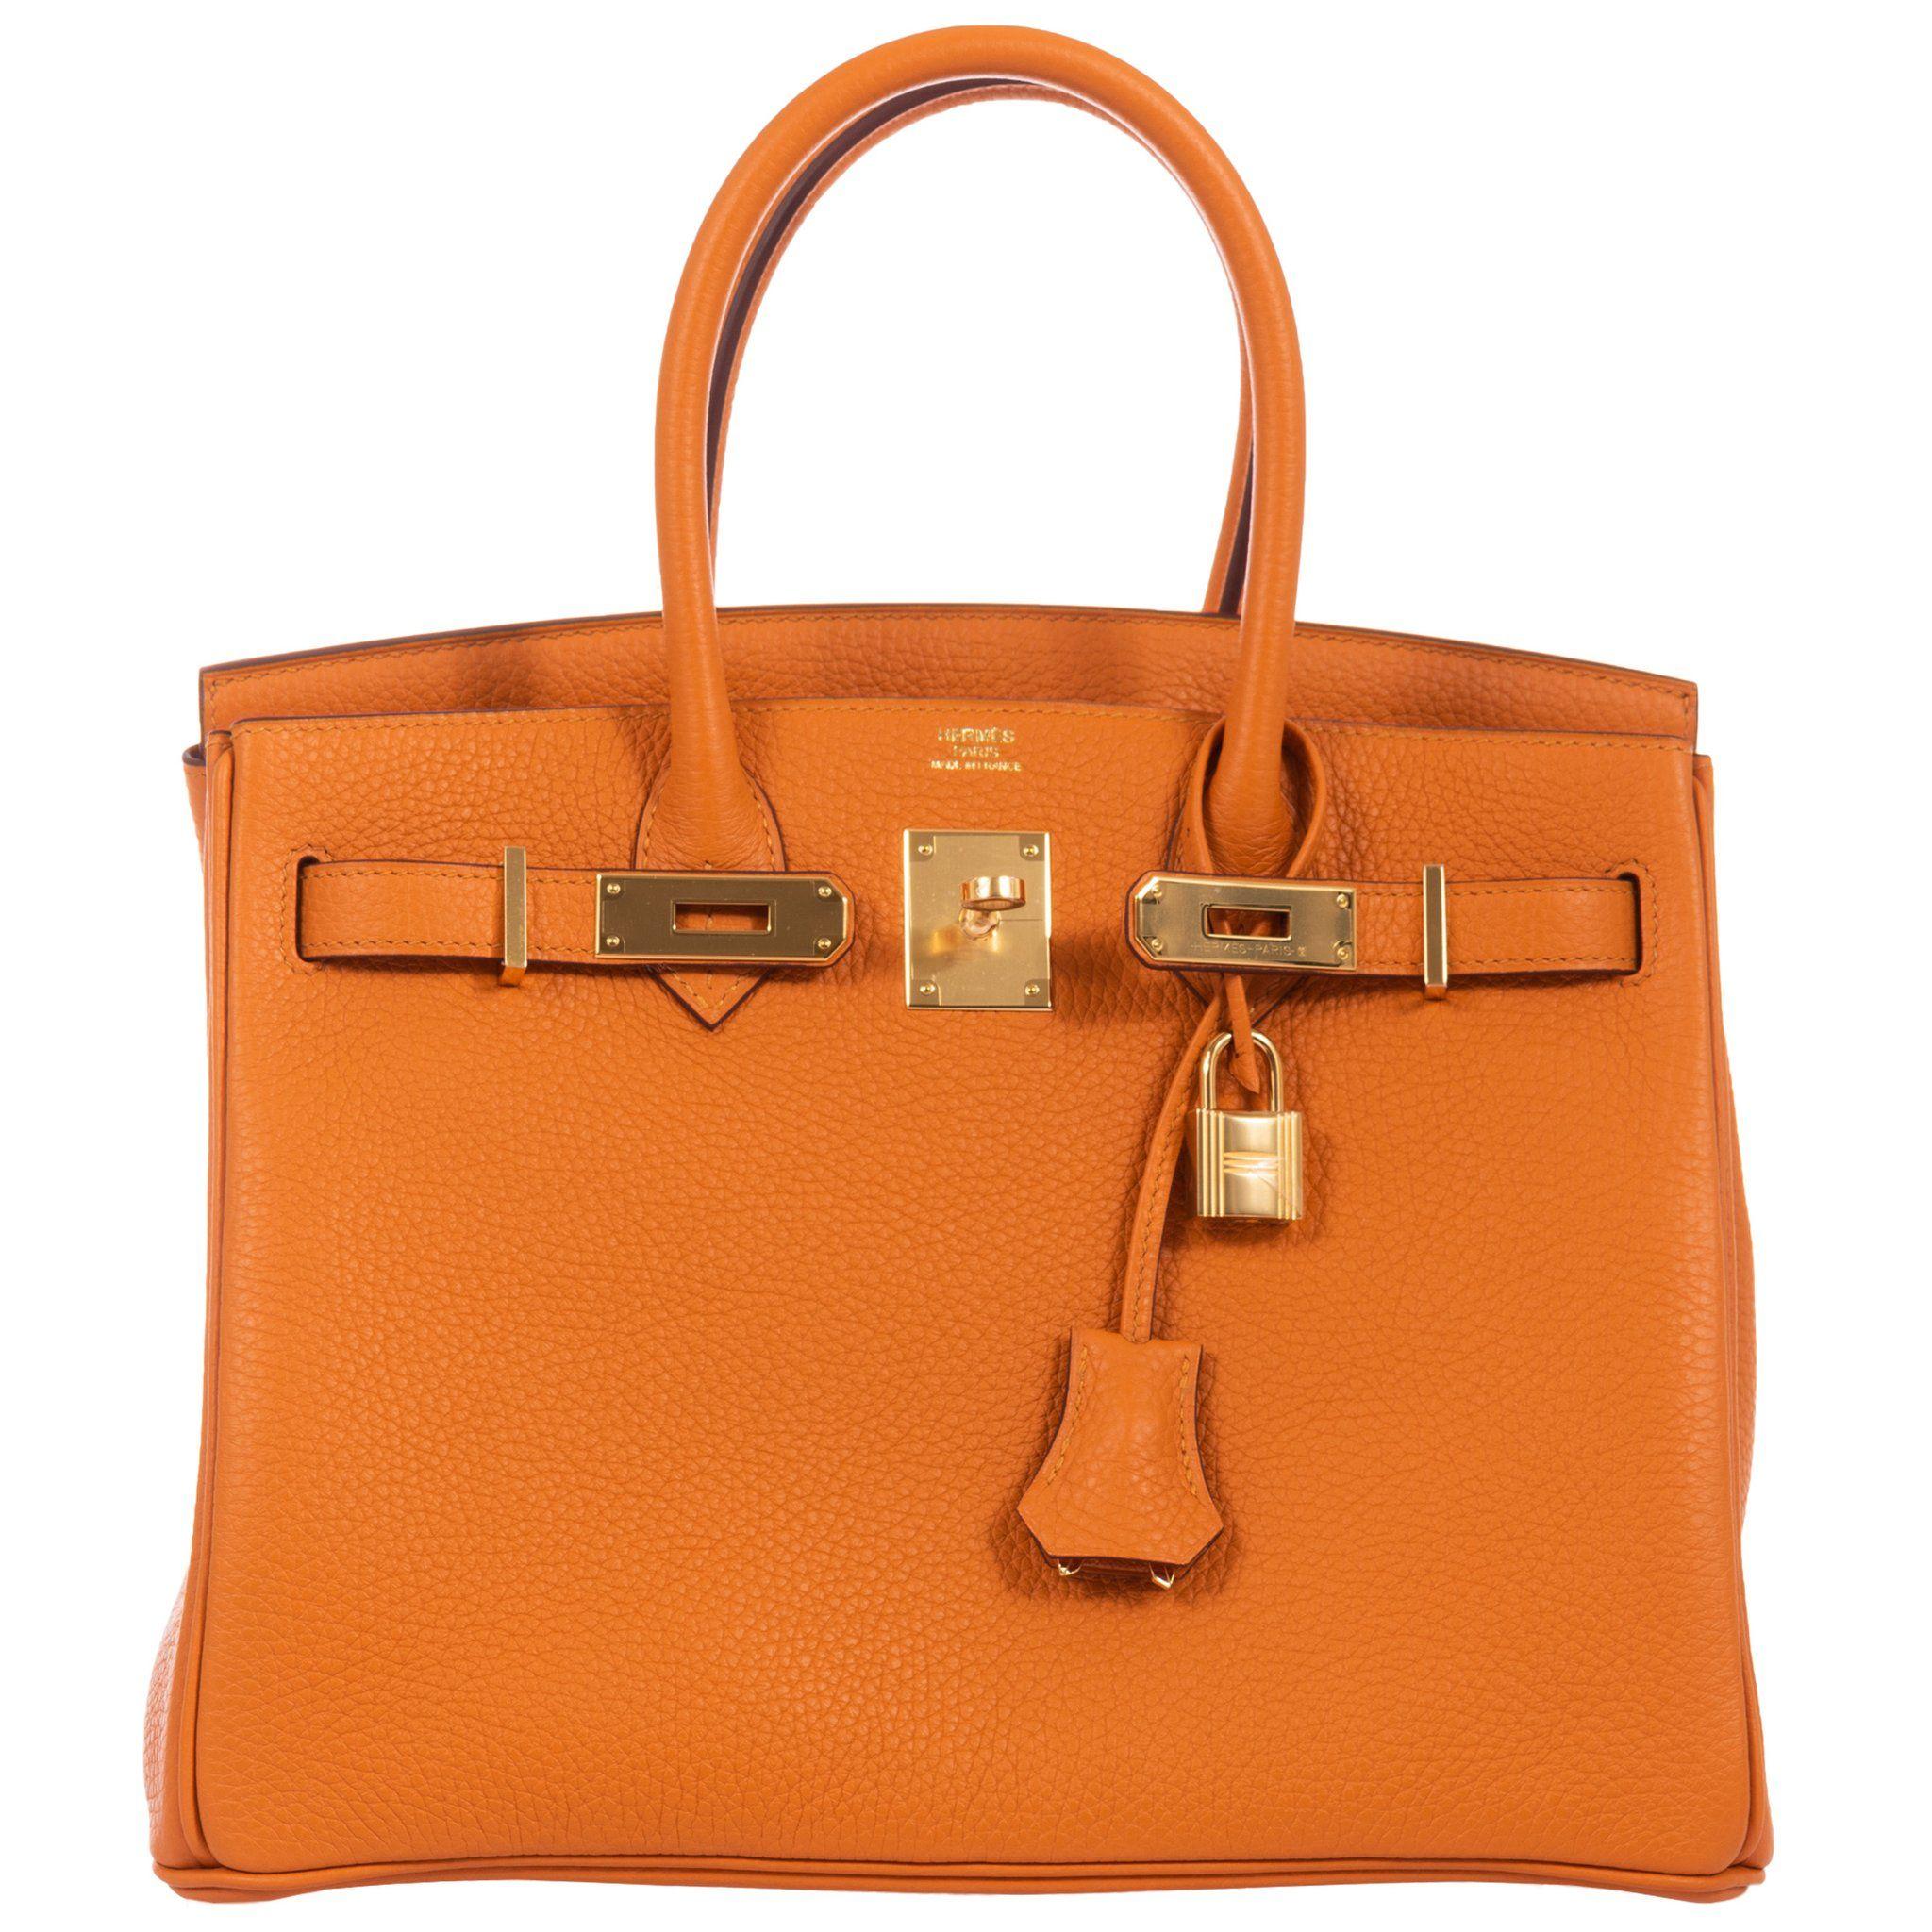 Hermes Birkin 30 Apricot Togo Gold Hardware   Luxury   Pinterest ... c288b1e5e2